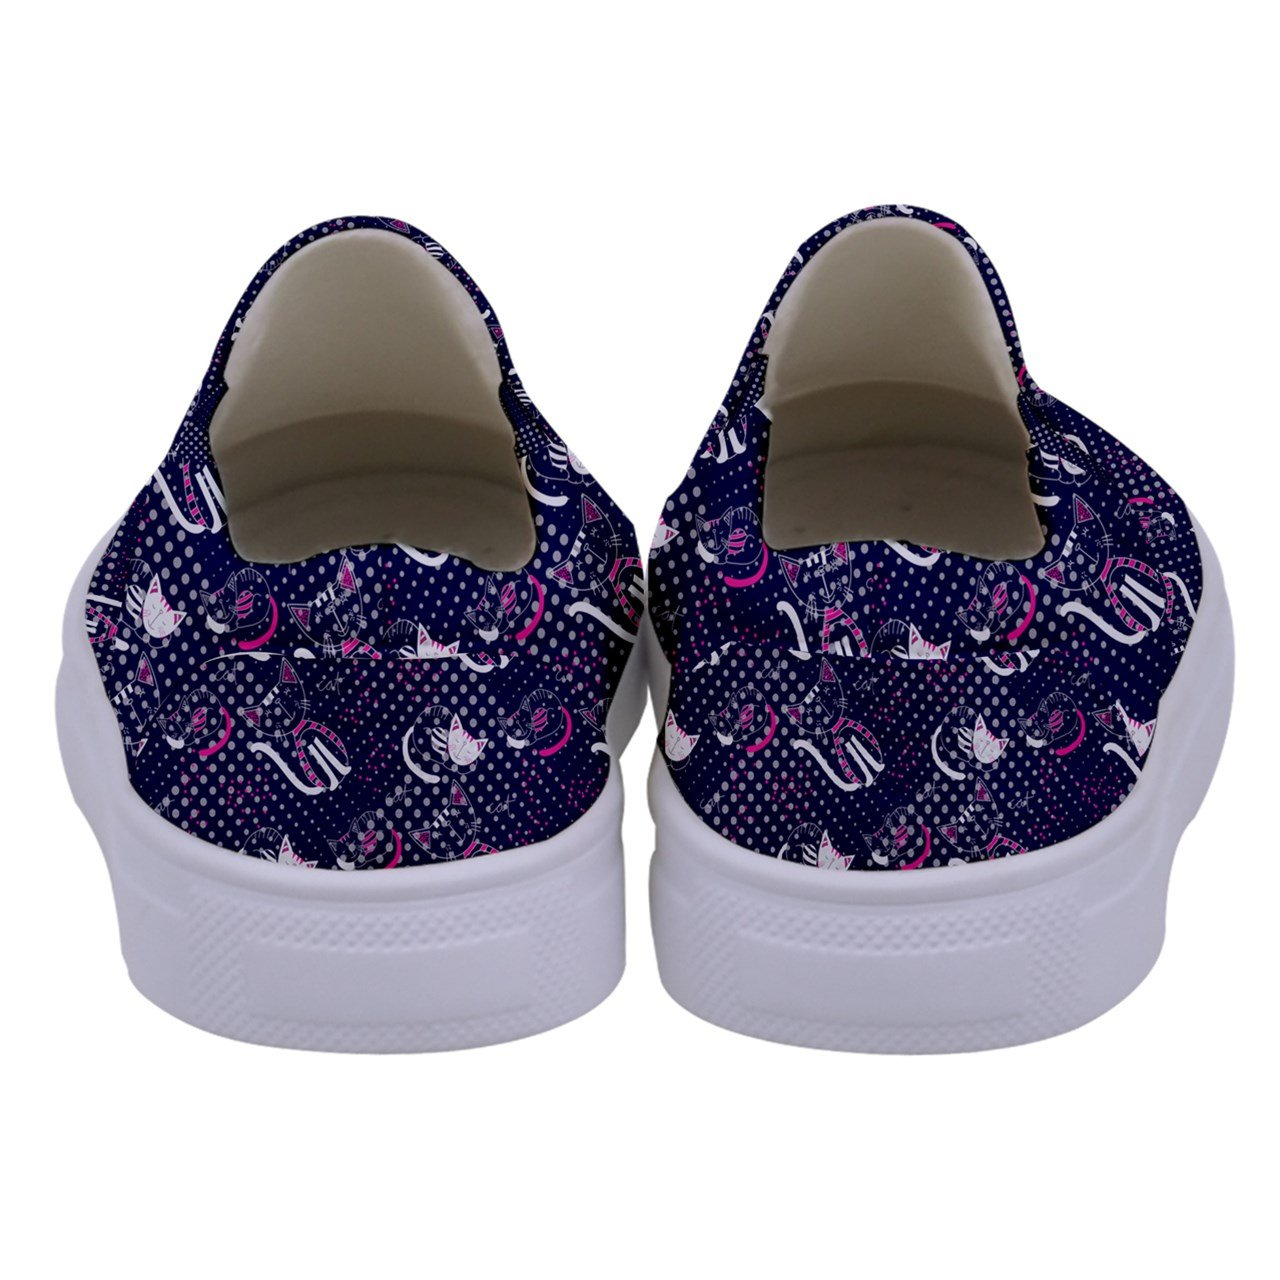 PattyCandy Girls Animals /& Nature Kids Canvas Slip-on Shoes Size:US 8C-7Y PattyCandy-129857265